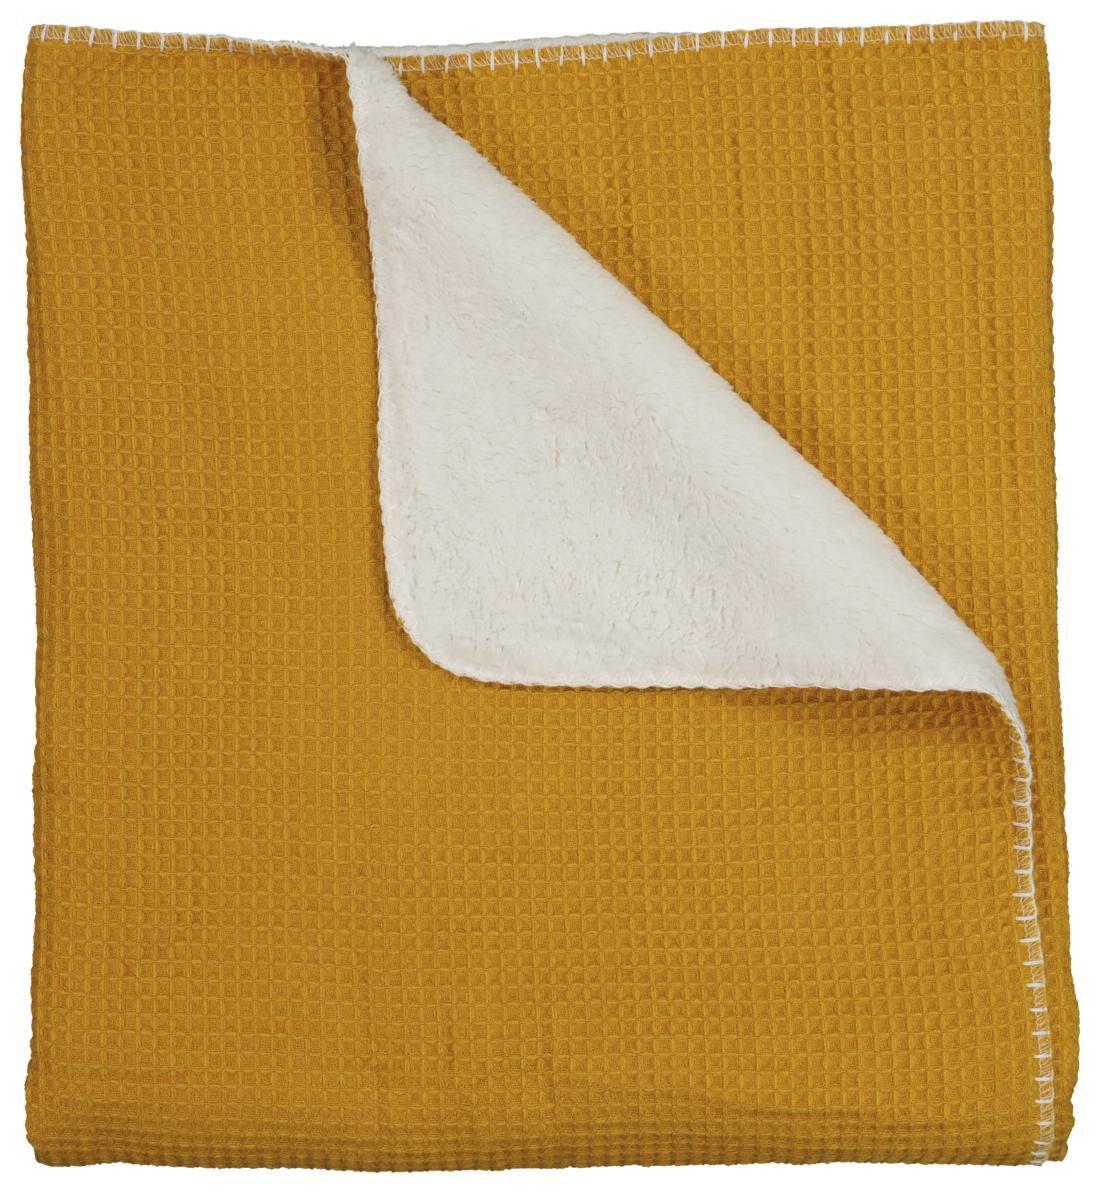 HEMA Plaid Wafel 130x150 - Sherpa - Geel (geel)